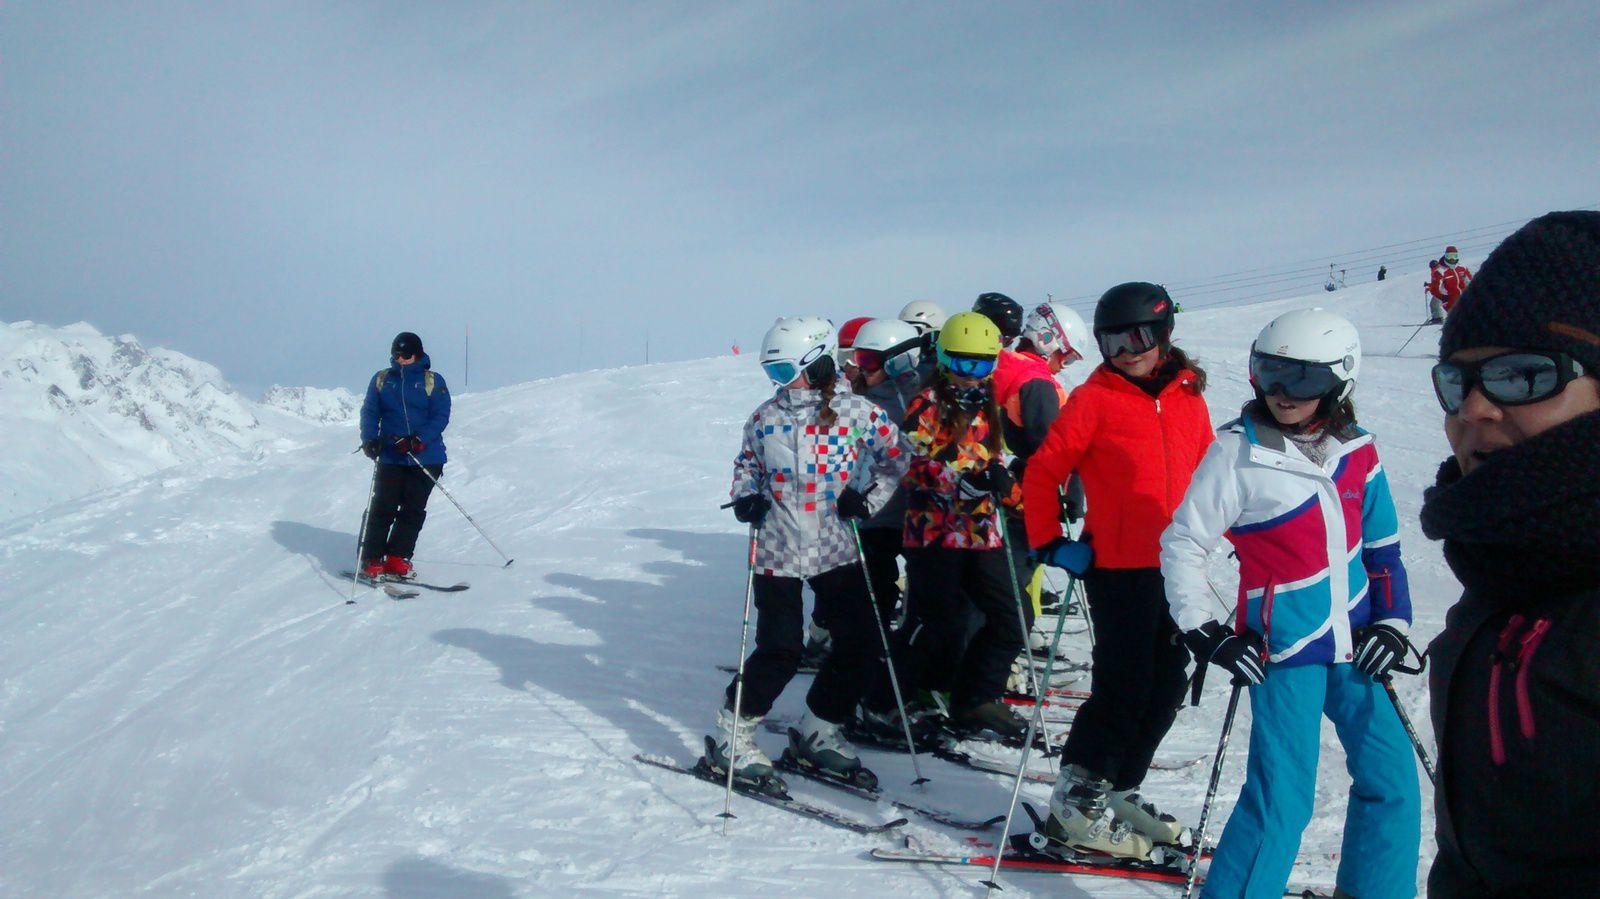 Mercredi c'est Ski puis Ski puis Ski......